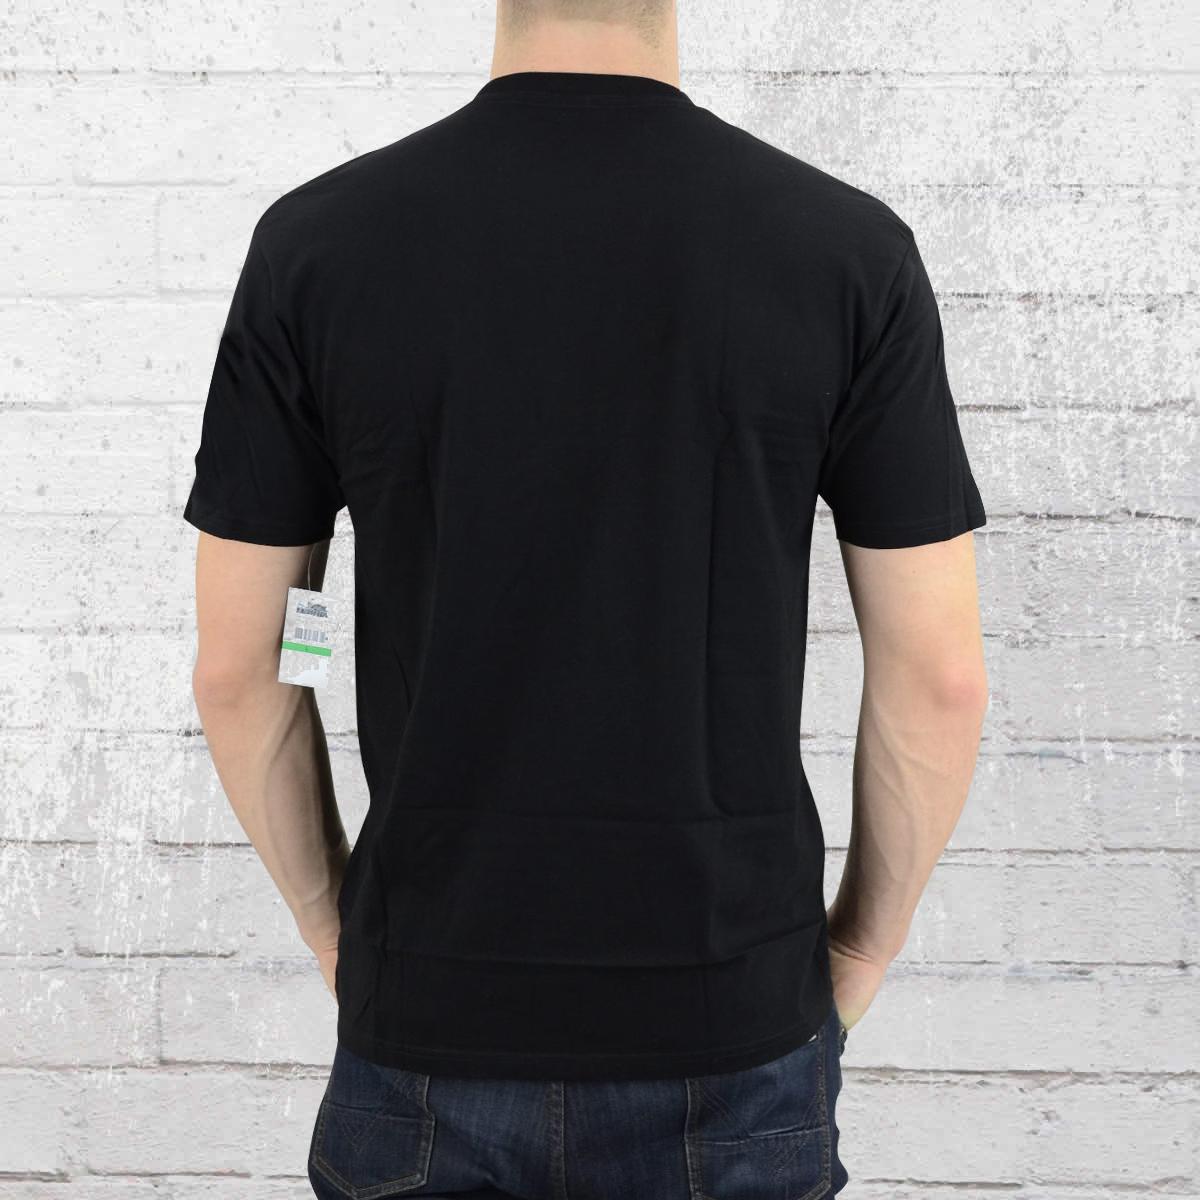 Metal Mulisha T-Shirt Tank Girls schwarz Top CHECK IT OUT